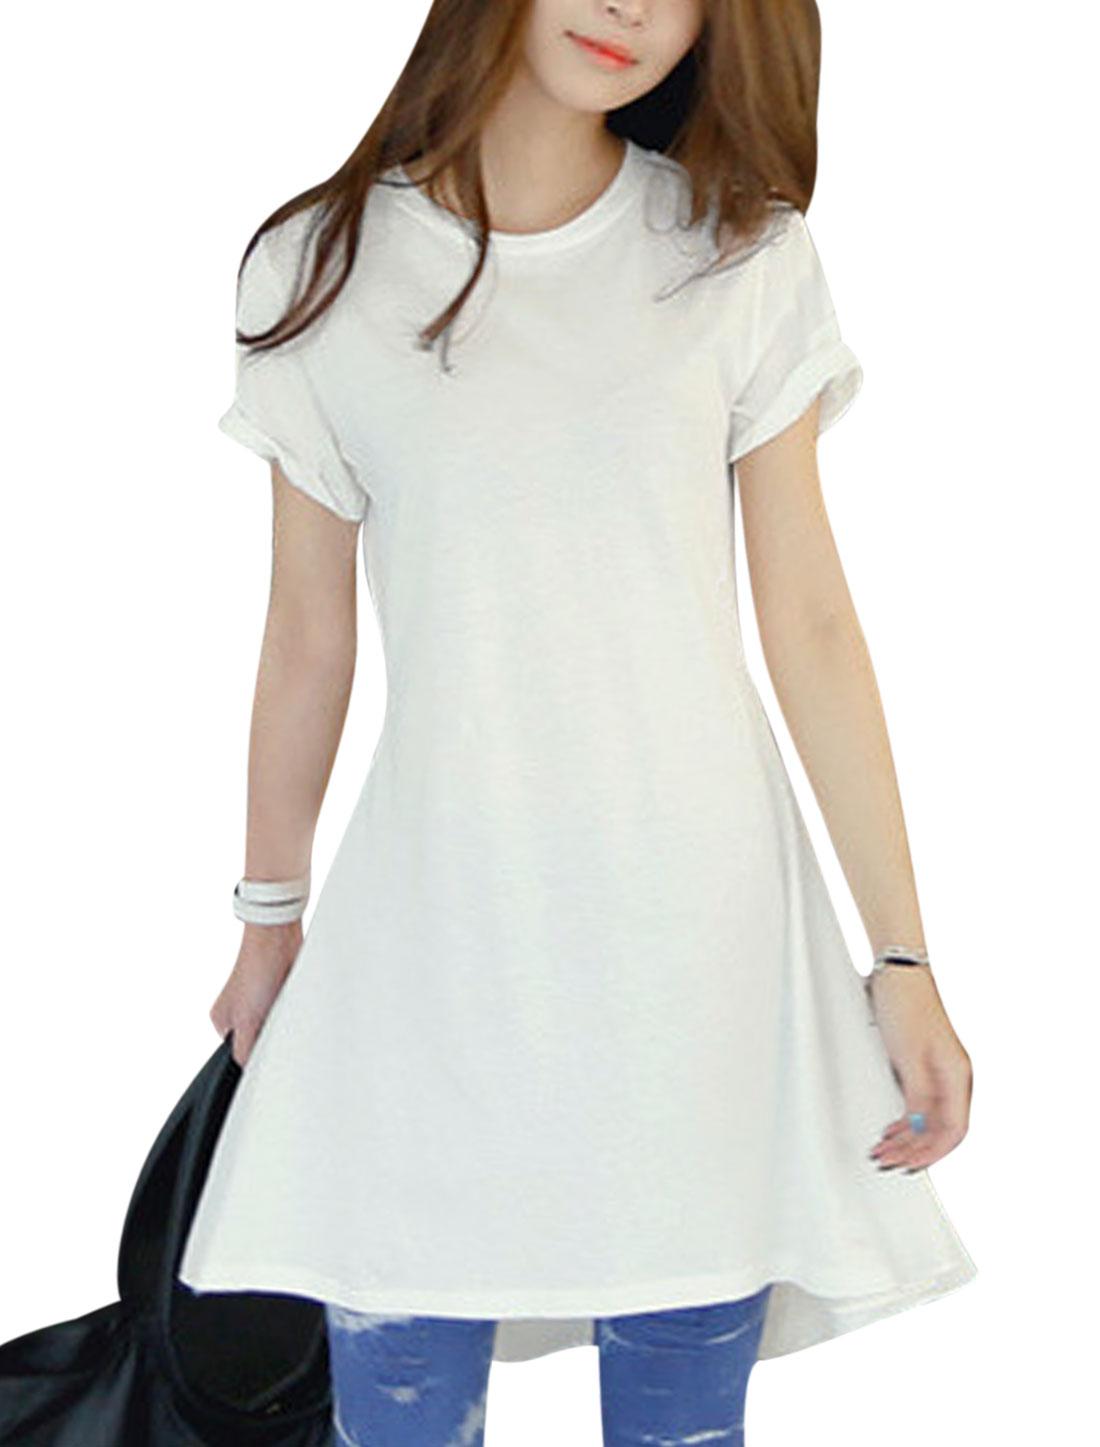 Women Round Neck Short Sleeves Low High Hem Tunic Tops White XS